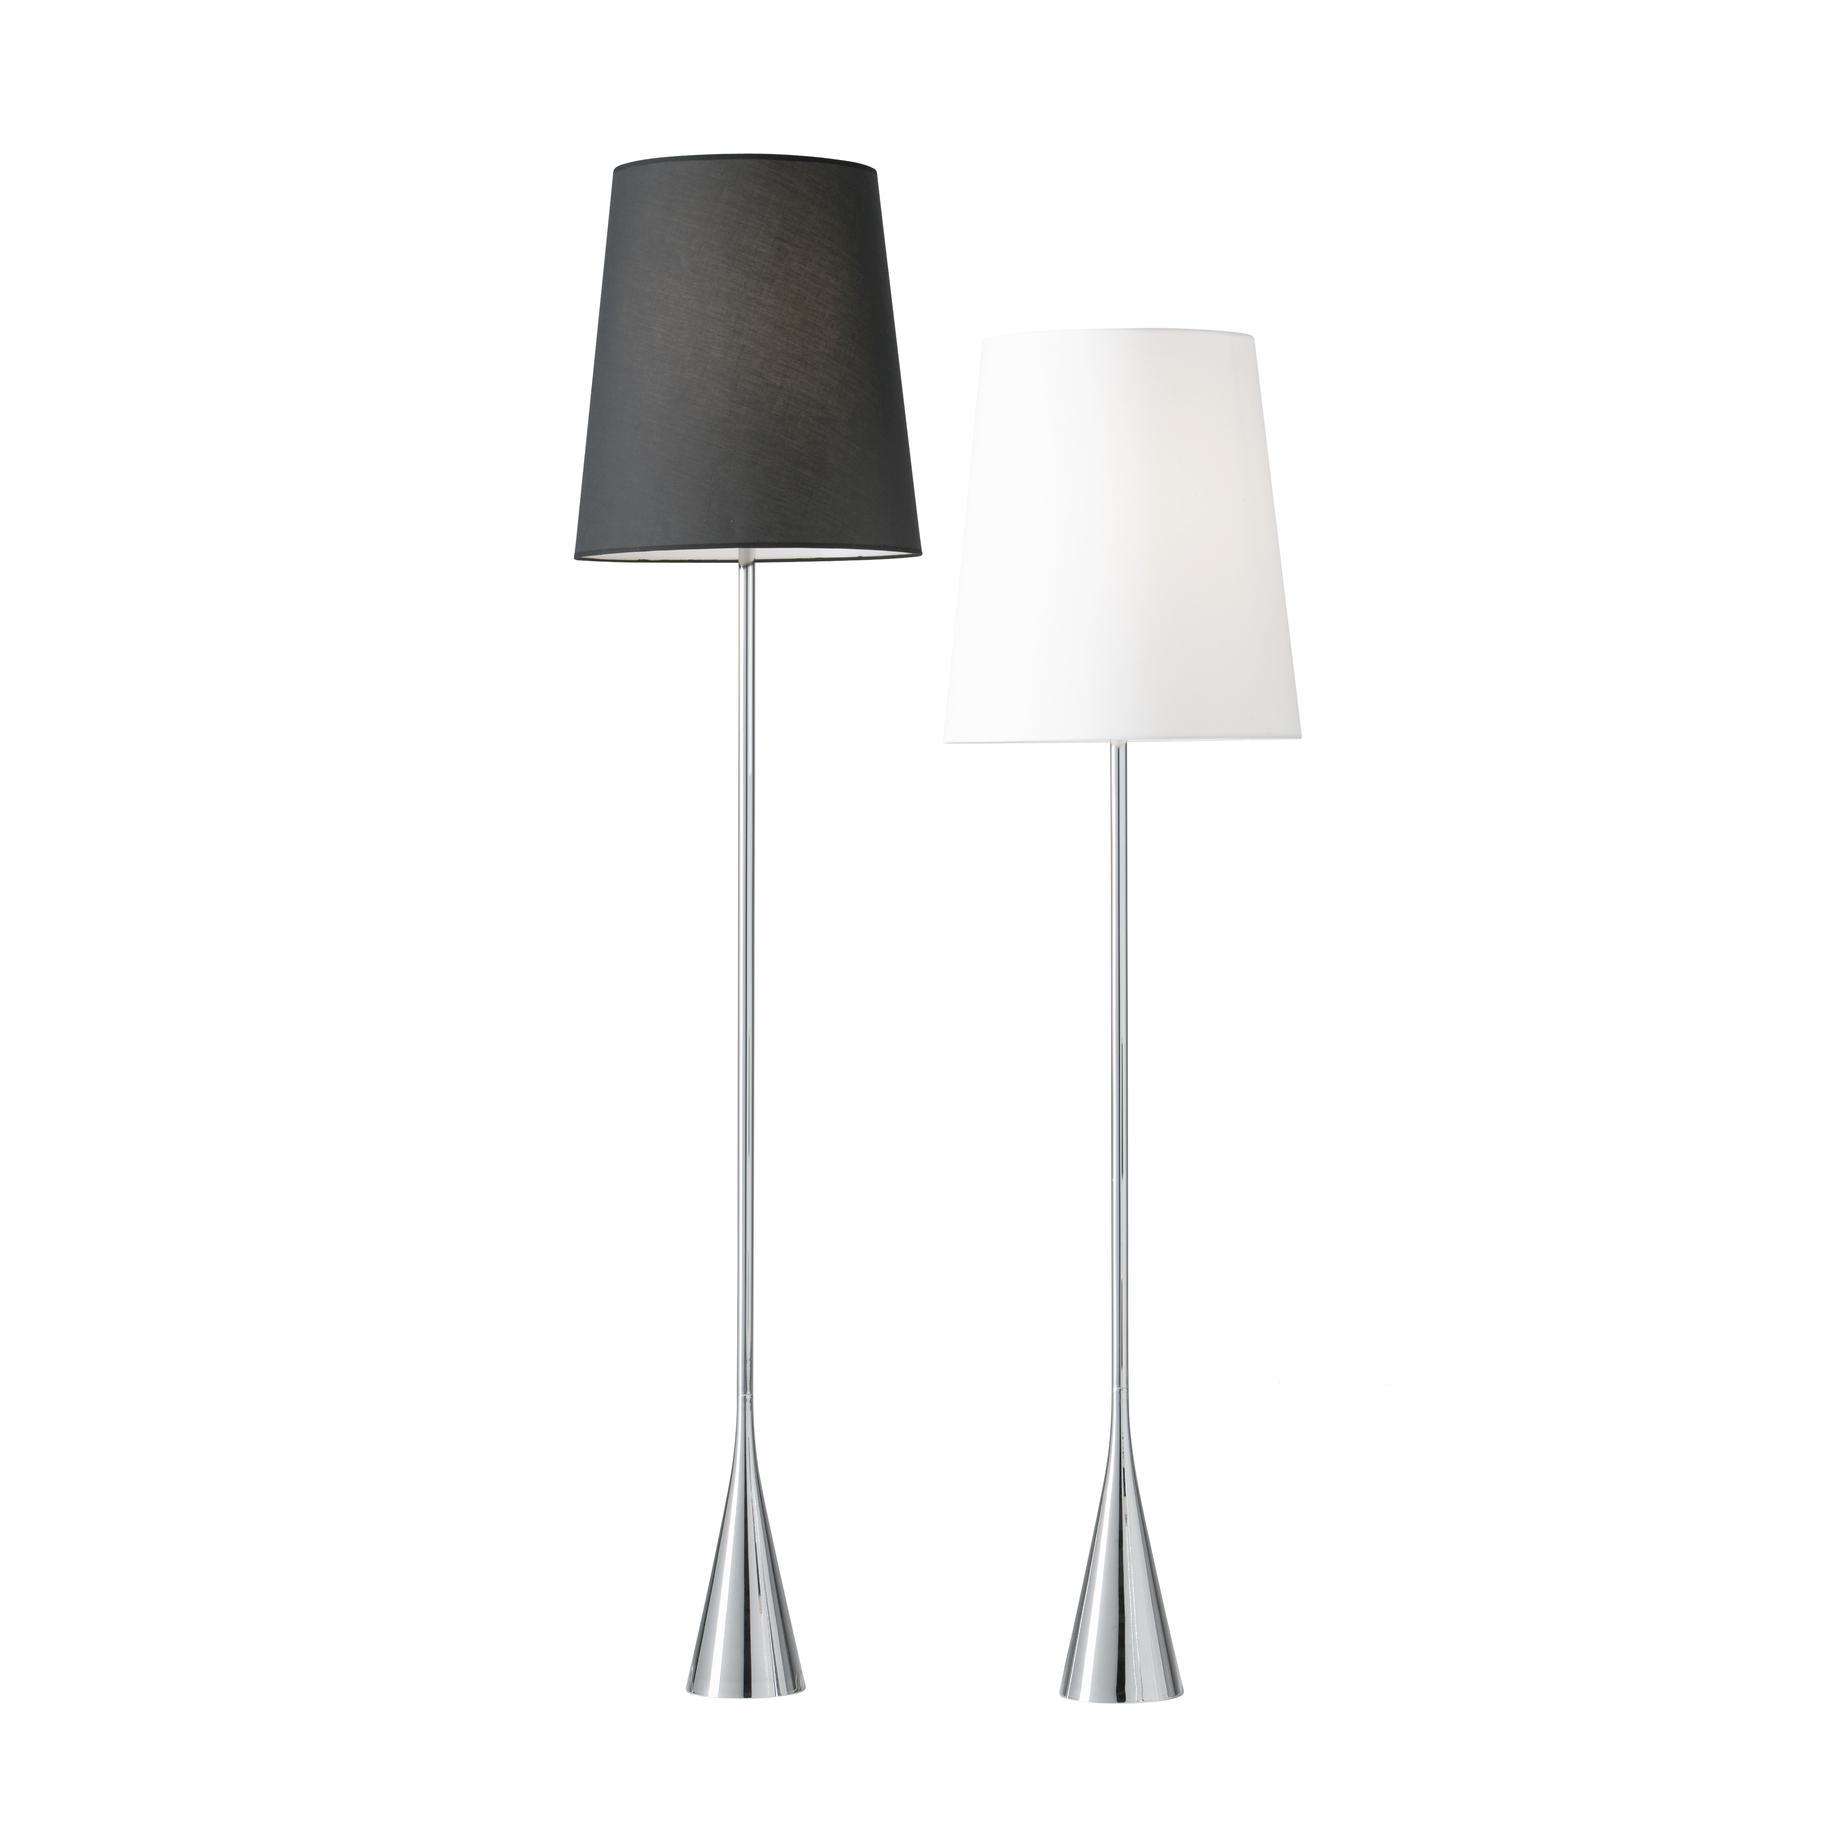 staande design lamp trendy modern floor lamp design leeslicht en dimbare led staande lamp with. Black Bedroom Furniture Sets. Home Design Ideas